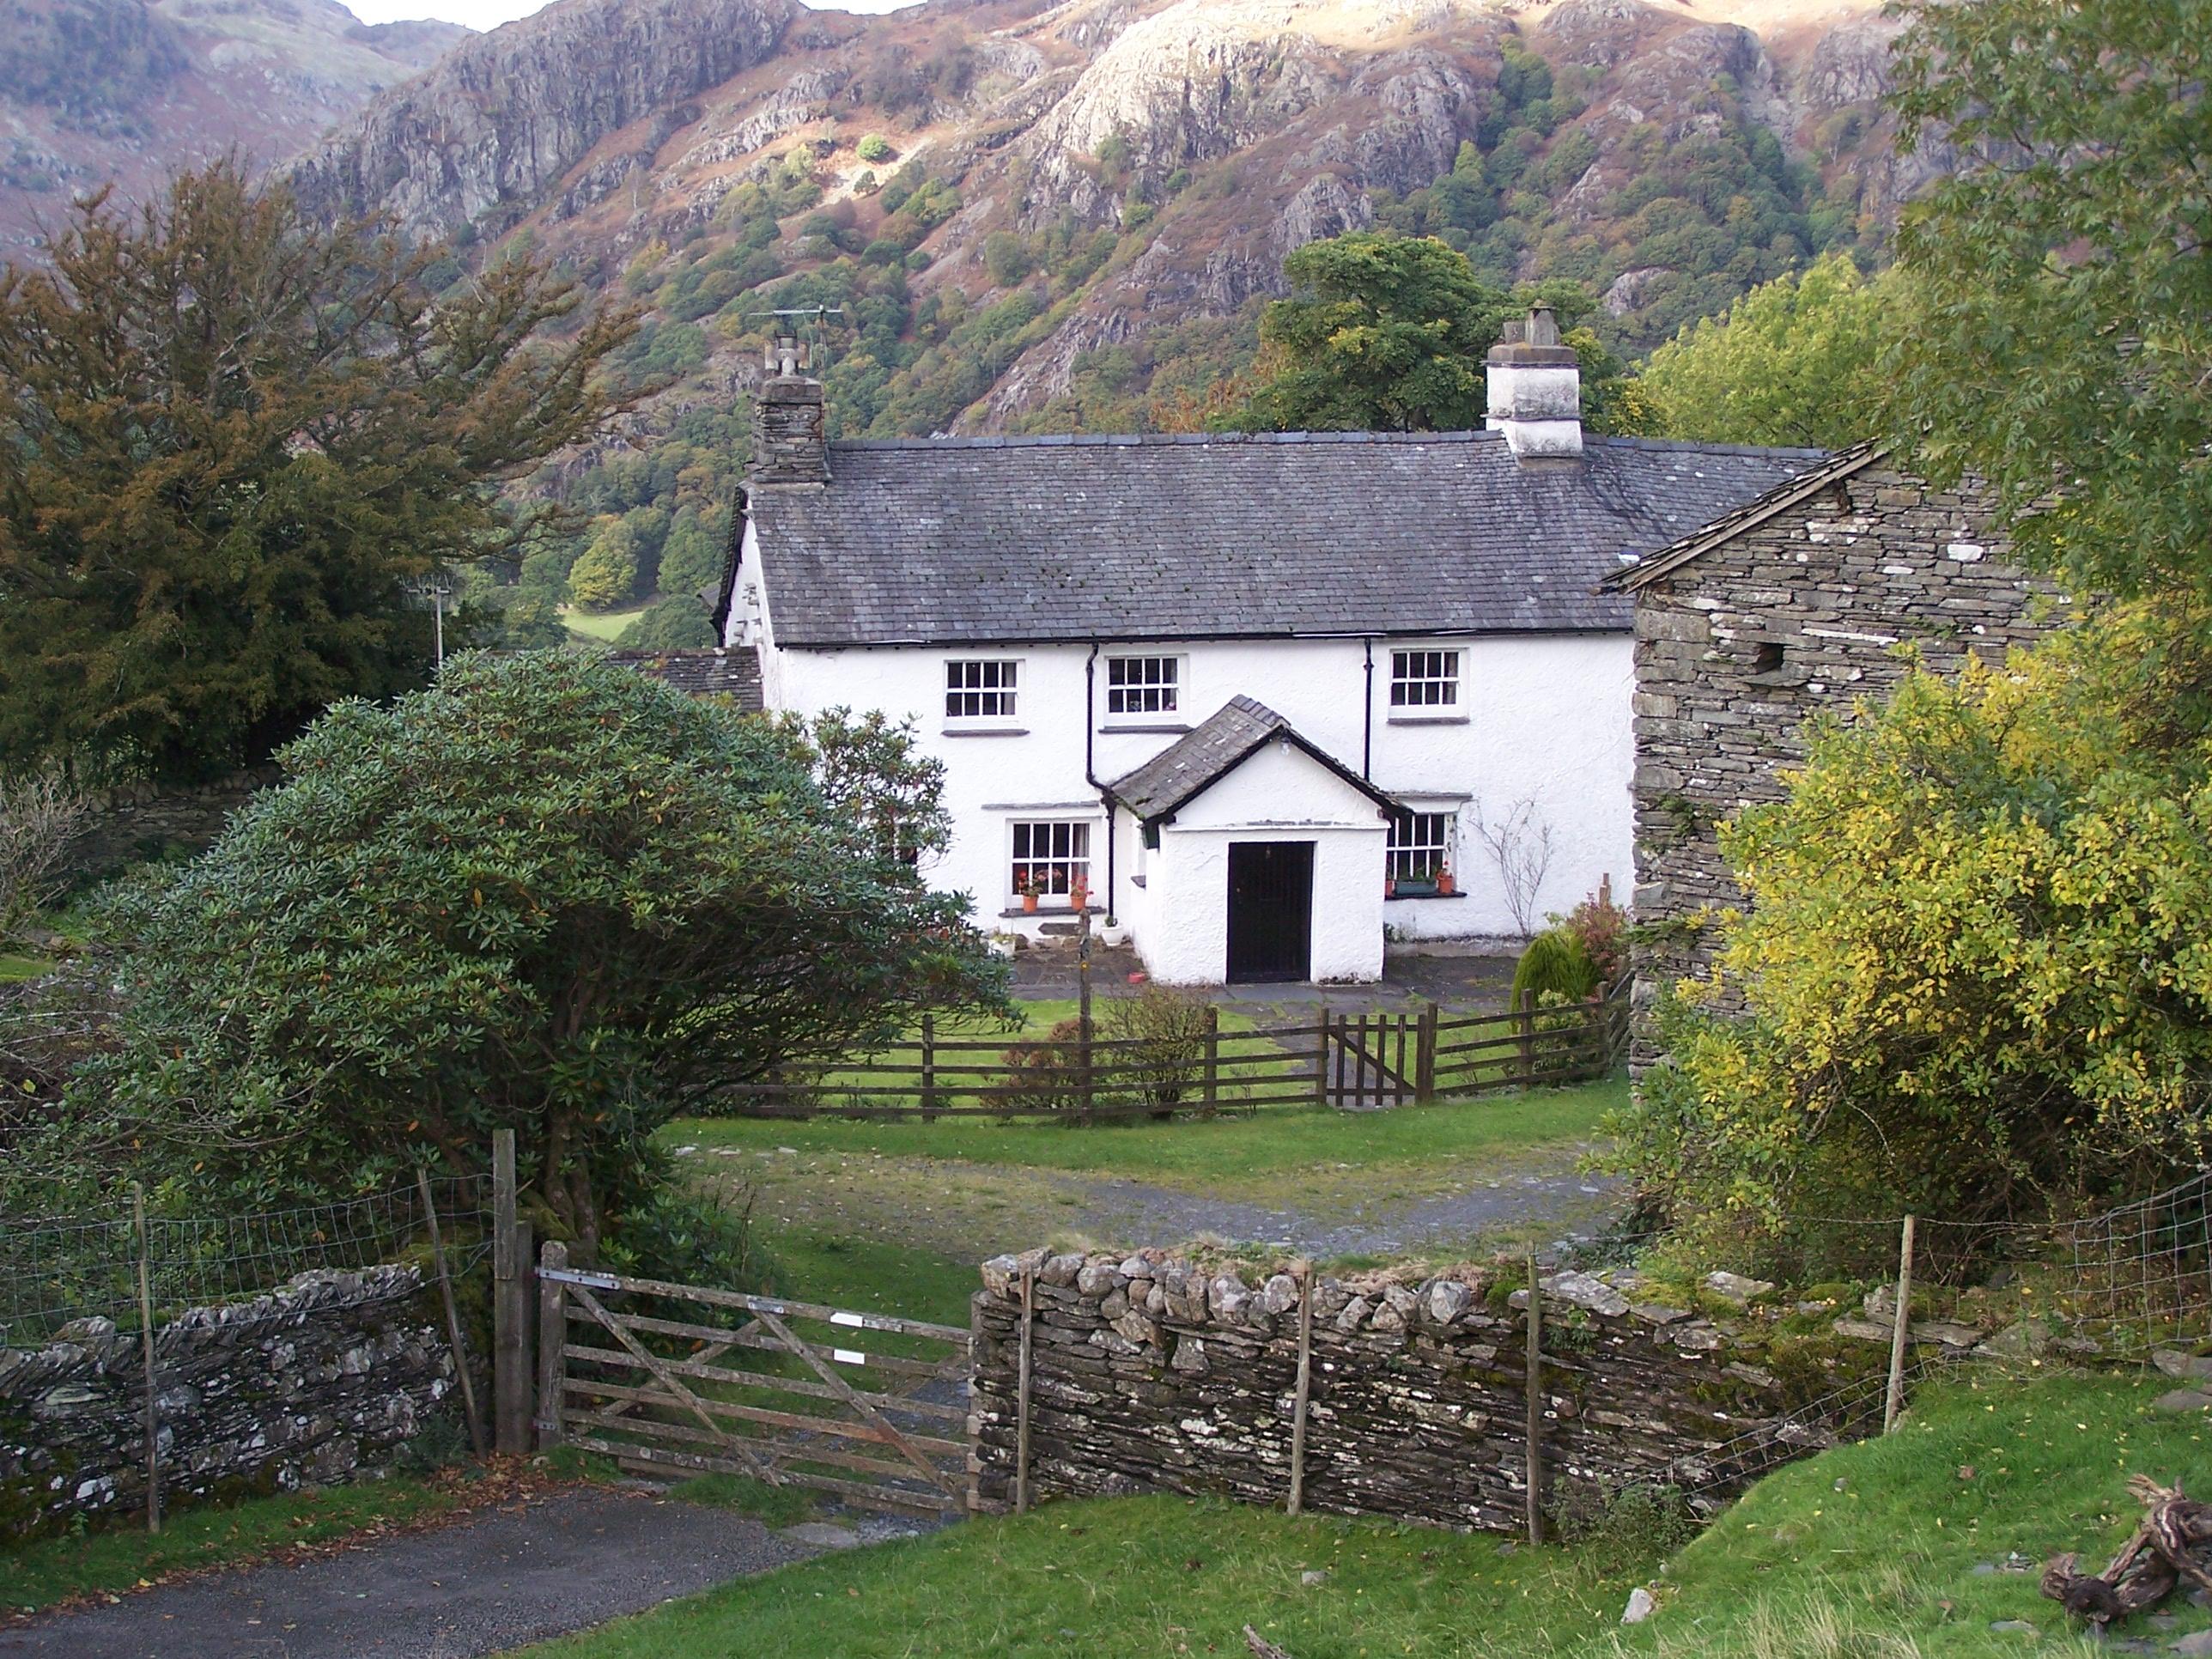 Holiday Rental Cottages